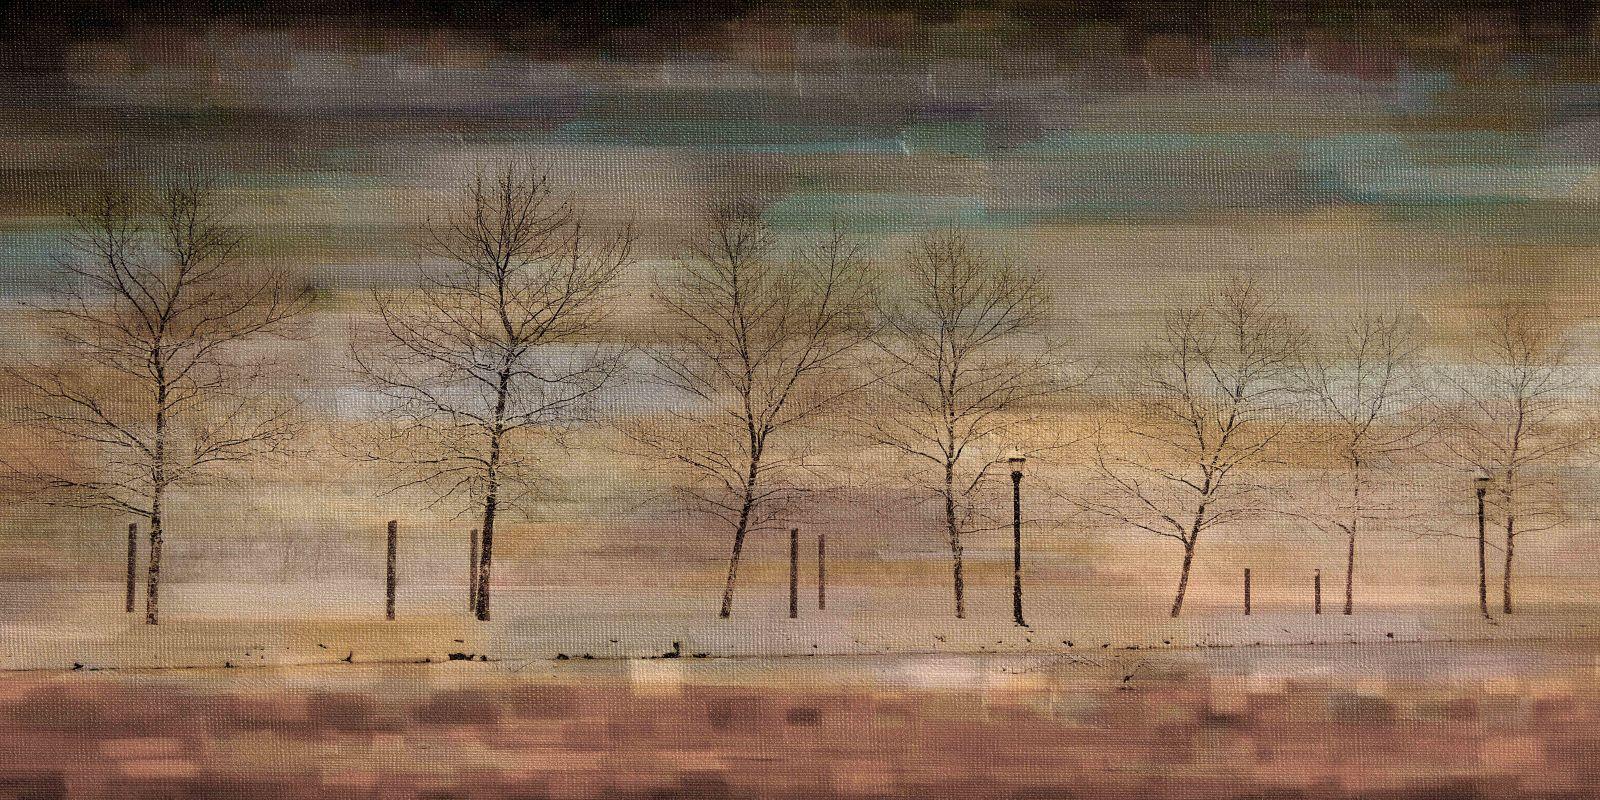 Parvez Taj The Woods Art Print on Premium Canvas 18 x 36 Home Decor Sale $115.00 ITEM: bci2686659 ID#:PTNOV-142-C-36 UPC: 708191045816 :